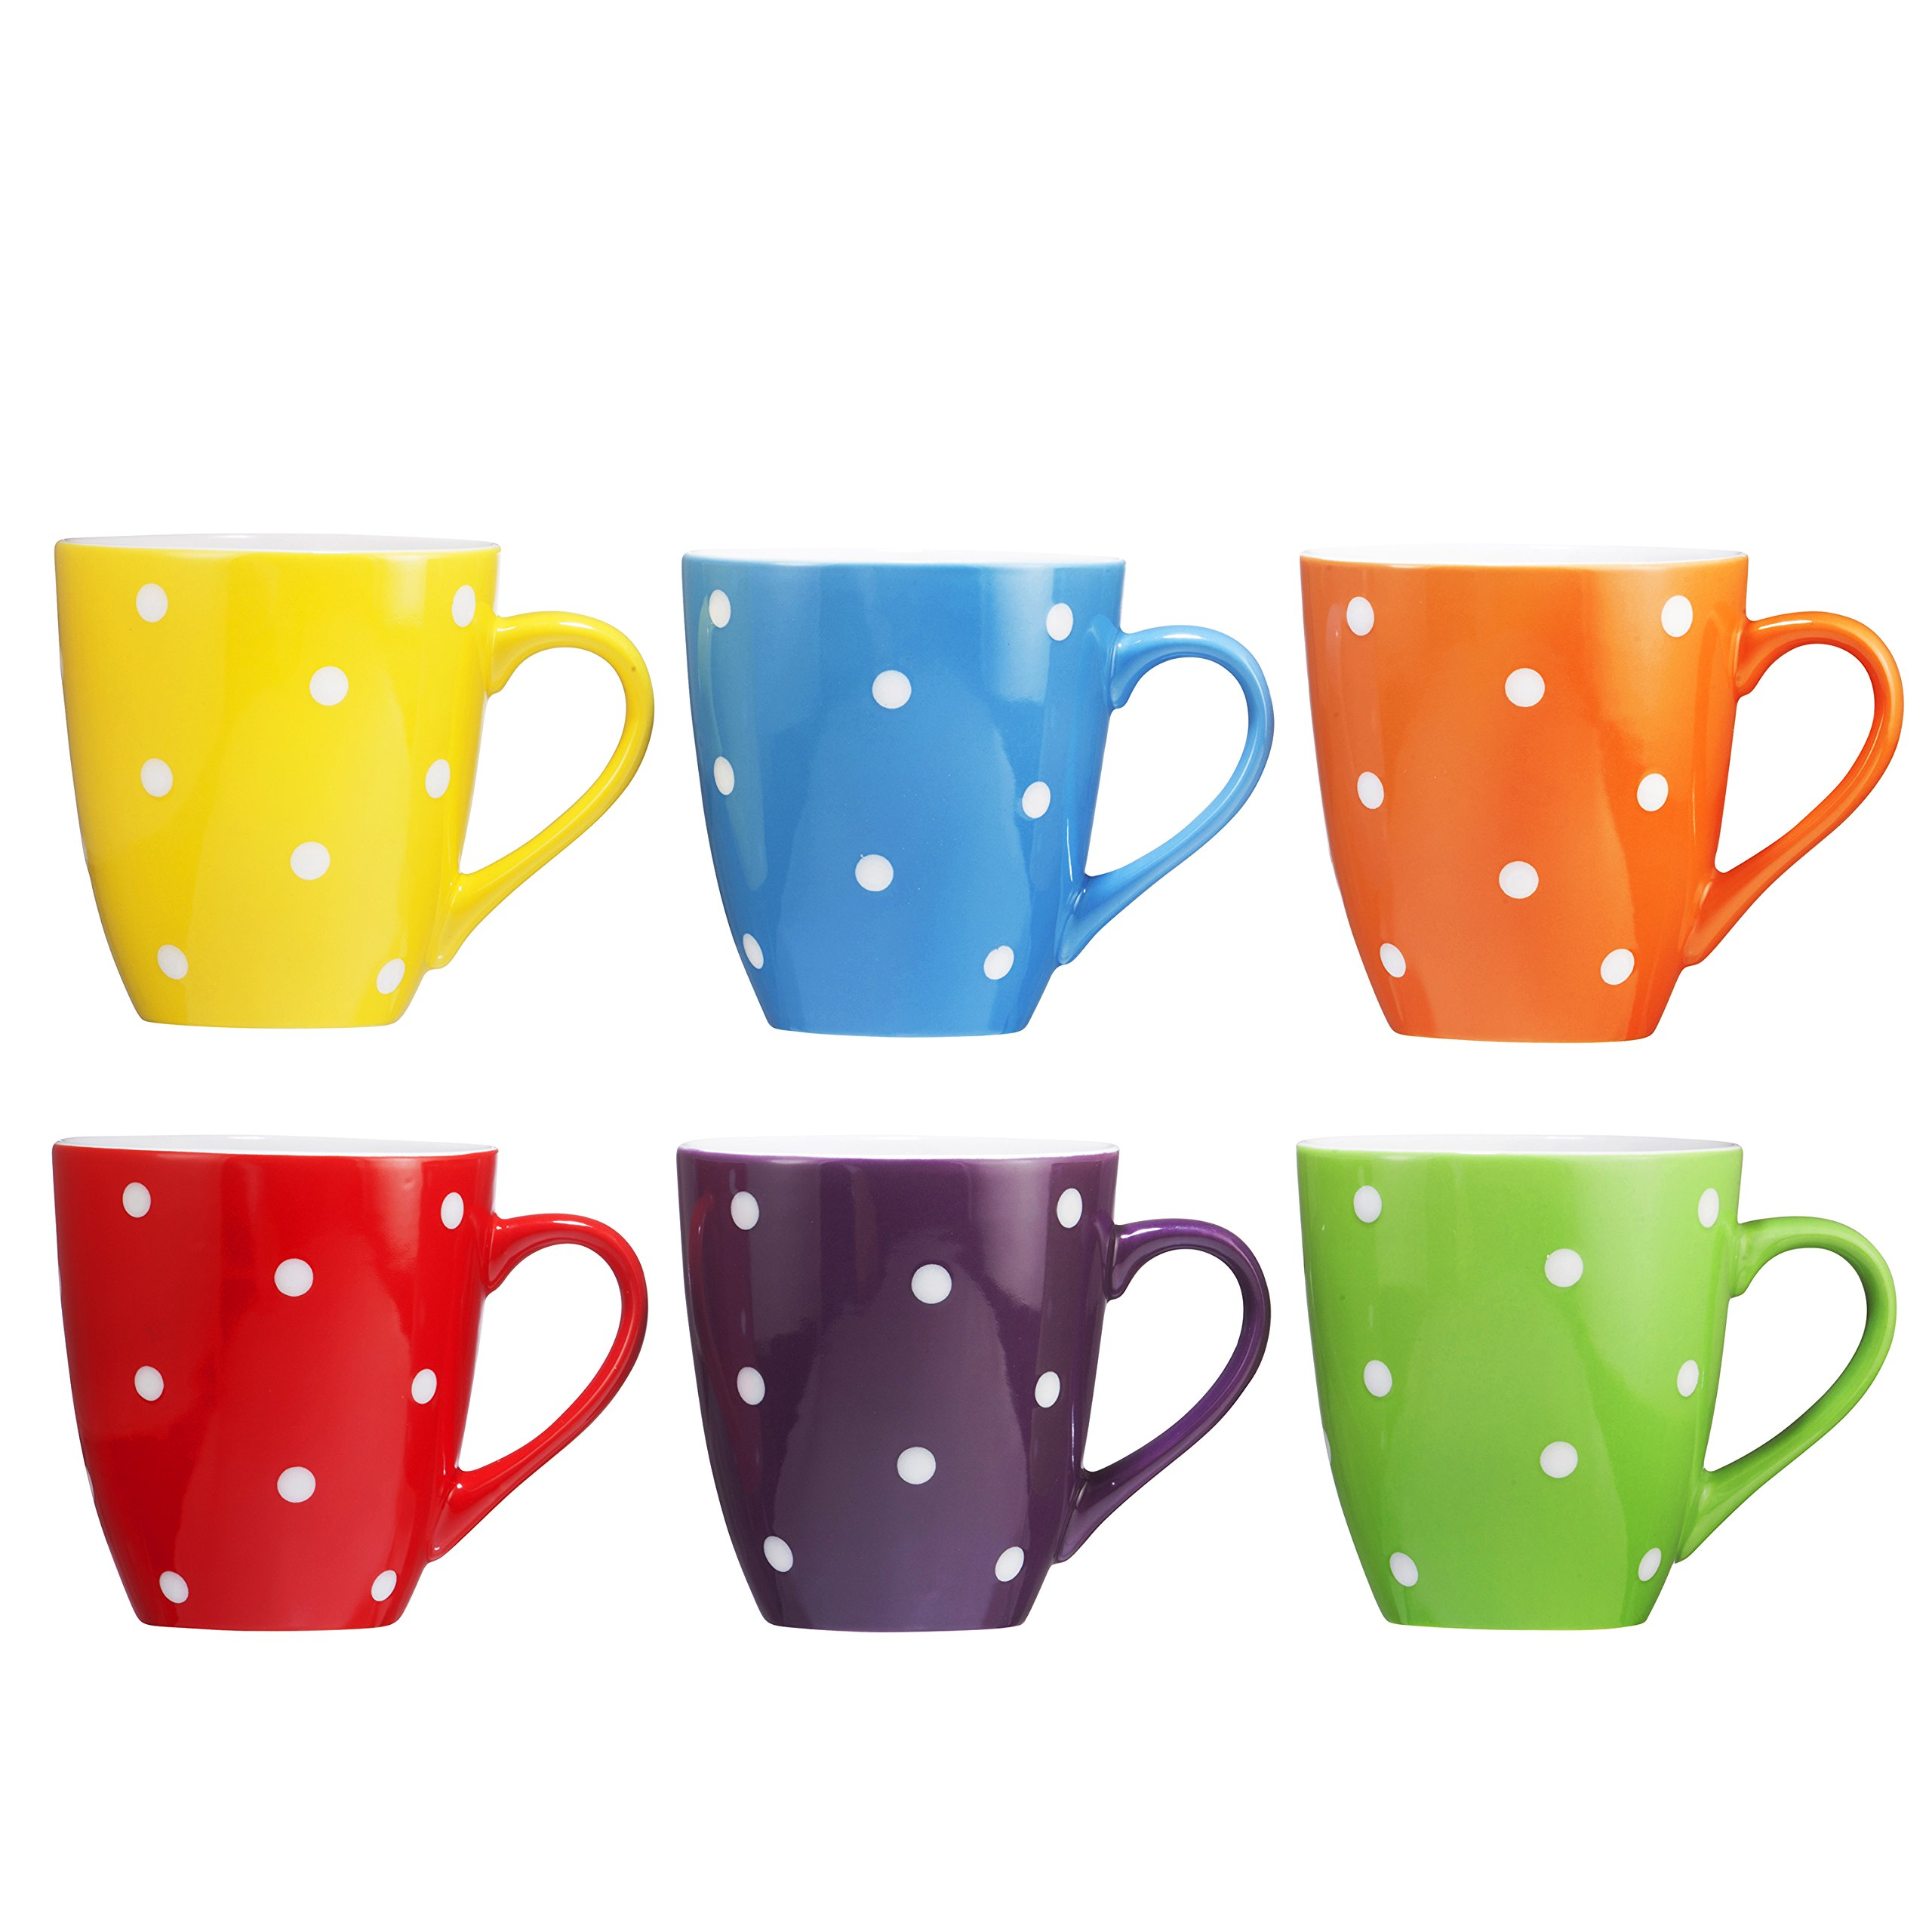 Coffee Mug Set Set of 6 Large-sized 16 Ounce Ceramic Coffee Mugs Restaurant Coffee Mugs By Bruntmor (Polka Dot) by Bruntmor (Image #3)